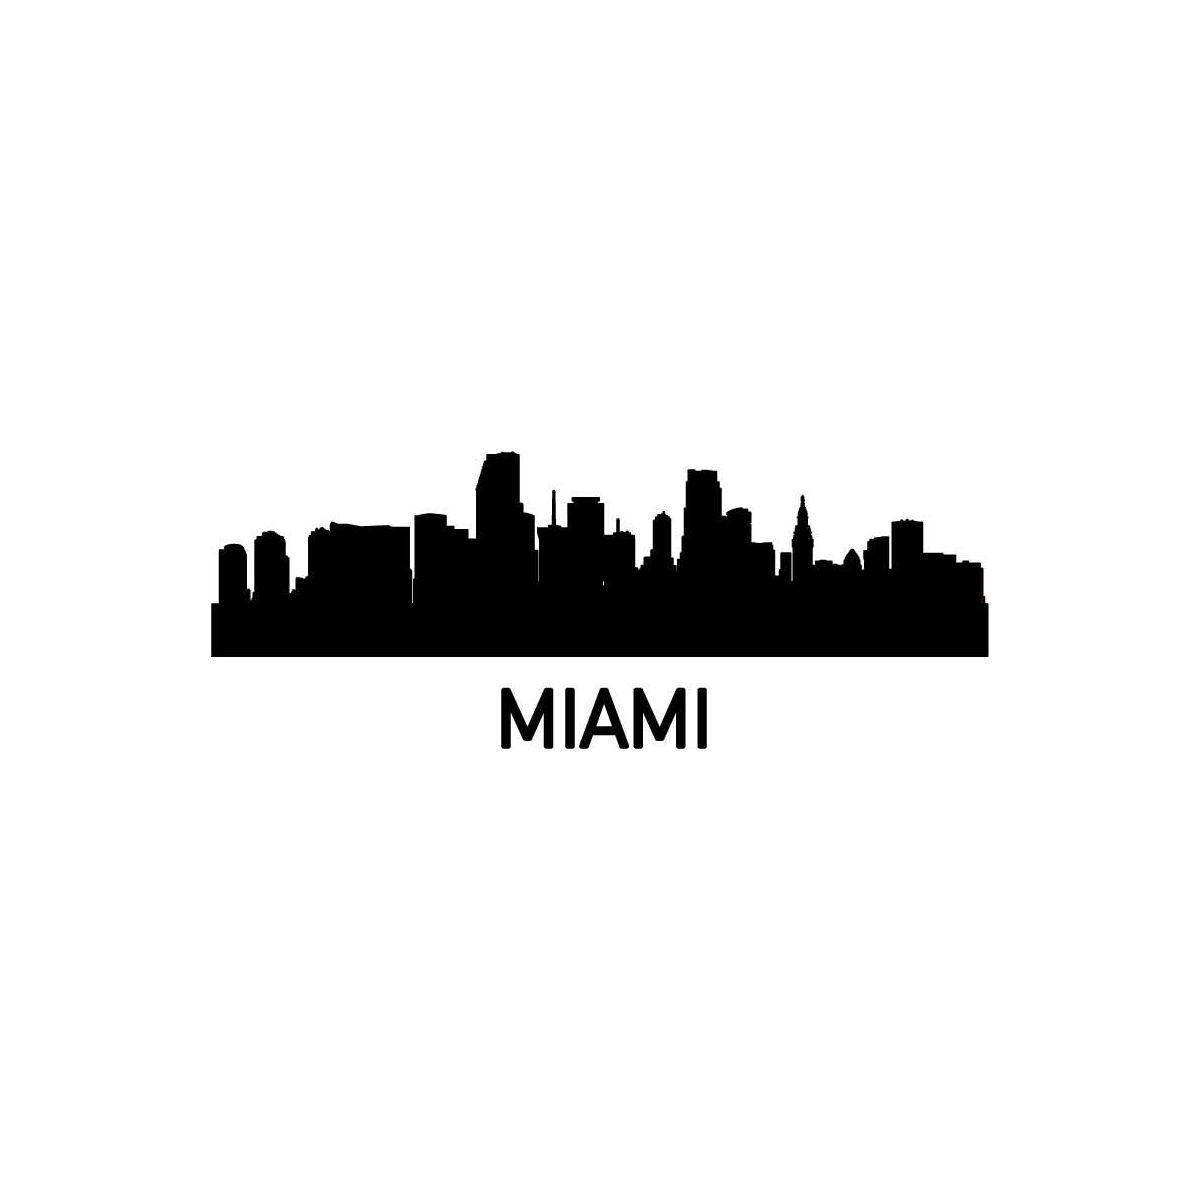 city of miami skyline tattoos - Google Search | Ink Inc